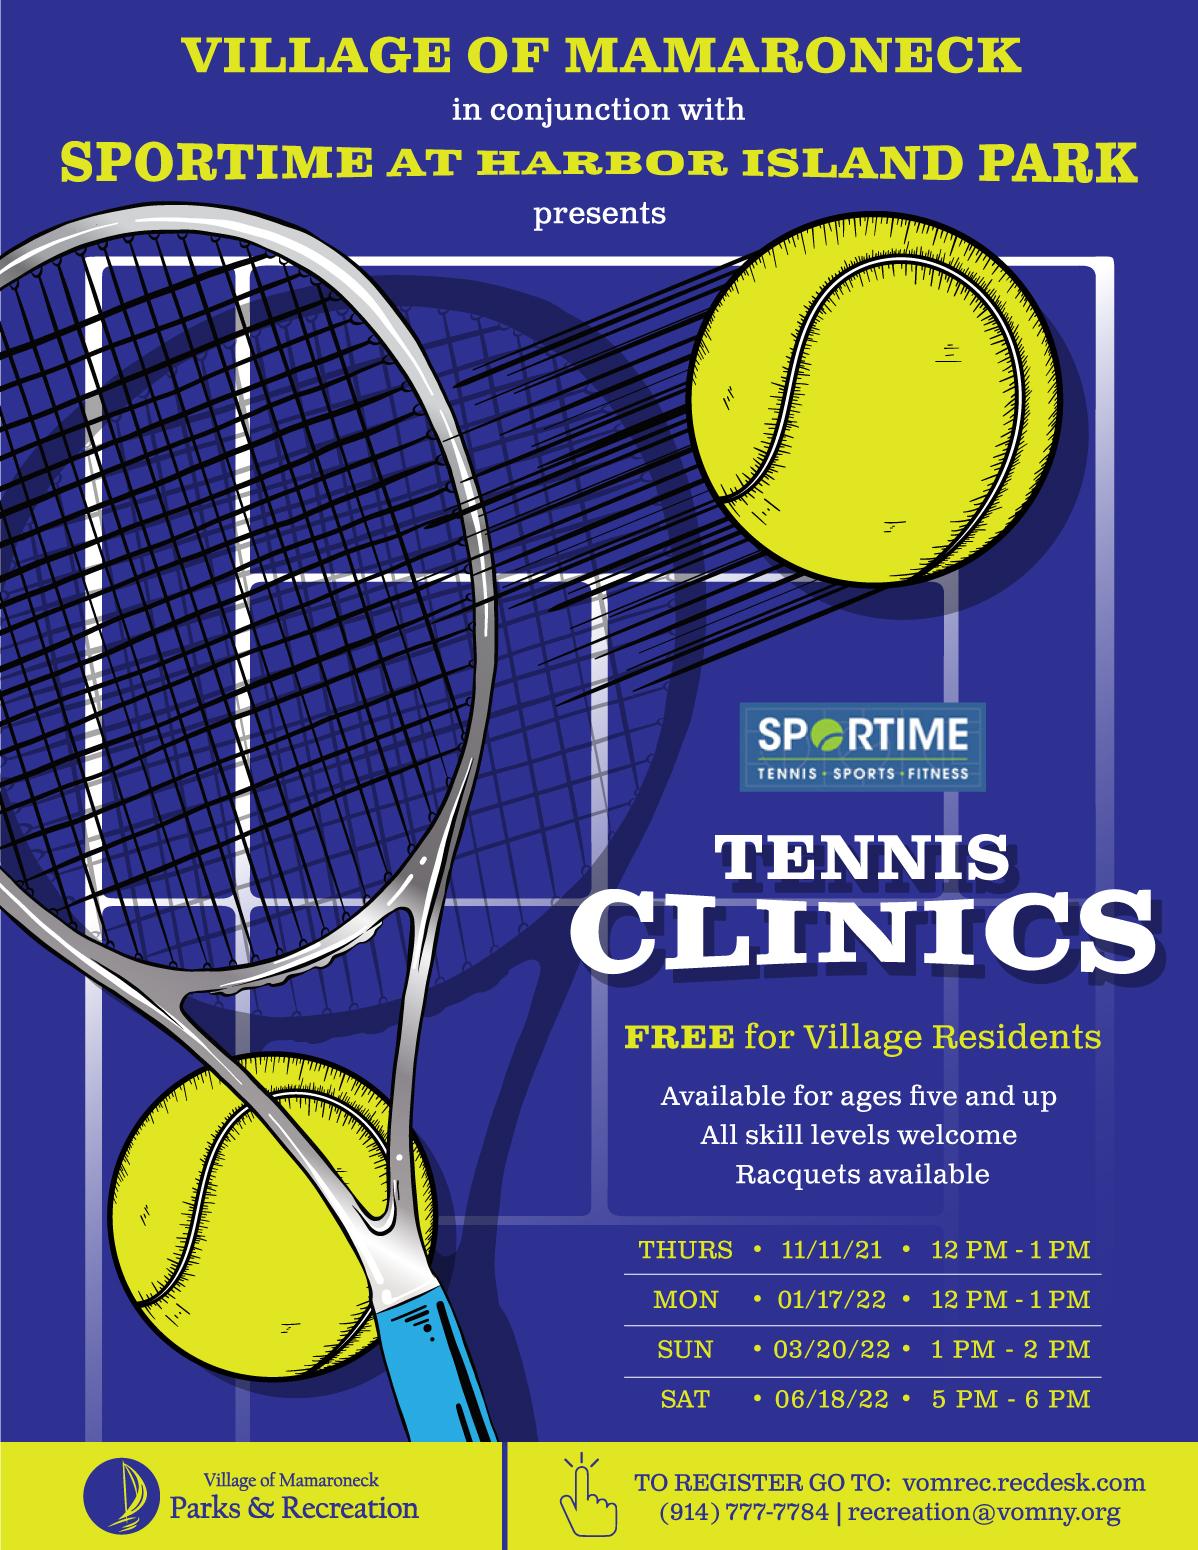 Tennis Clinics 2021 at Harbor Island Park